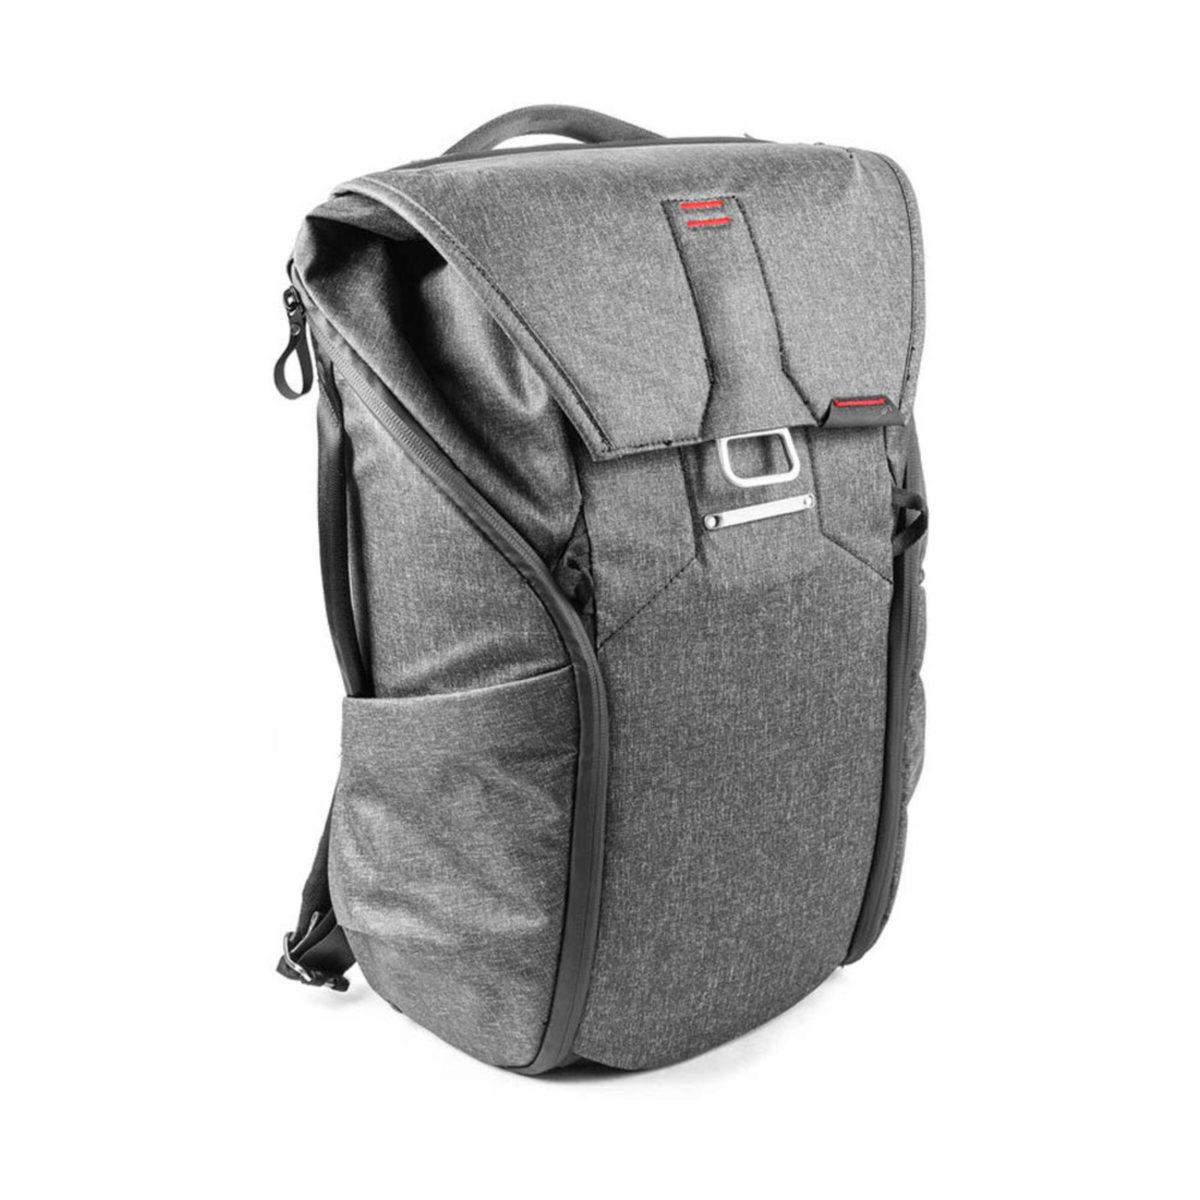 peak_design_everyday_backpack_30l_cc_02